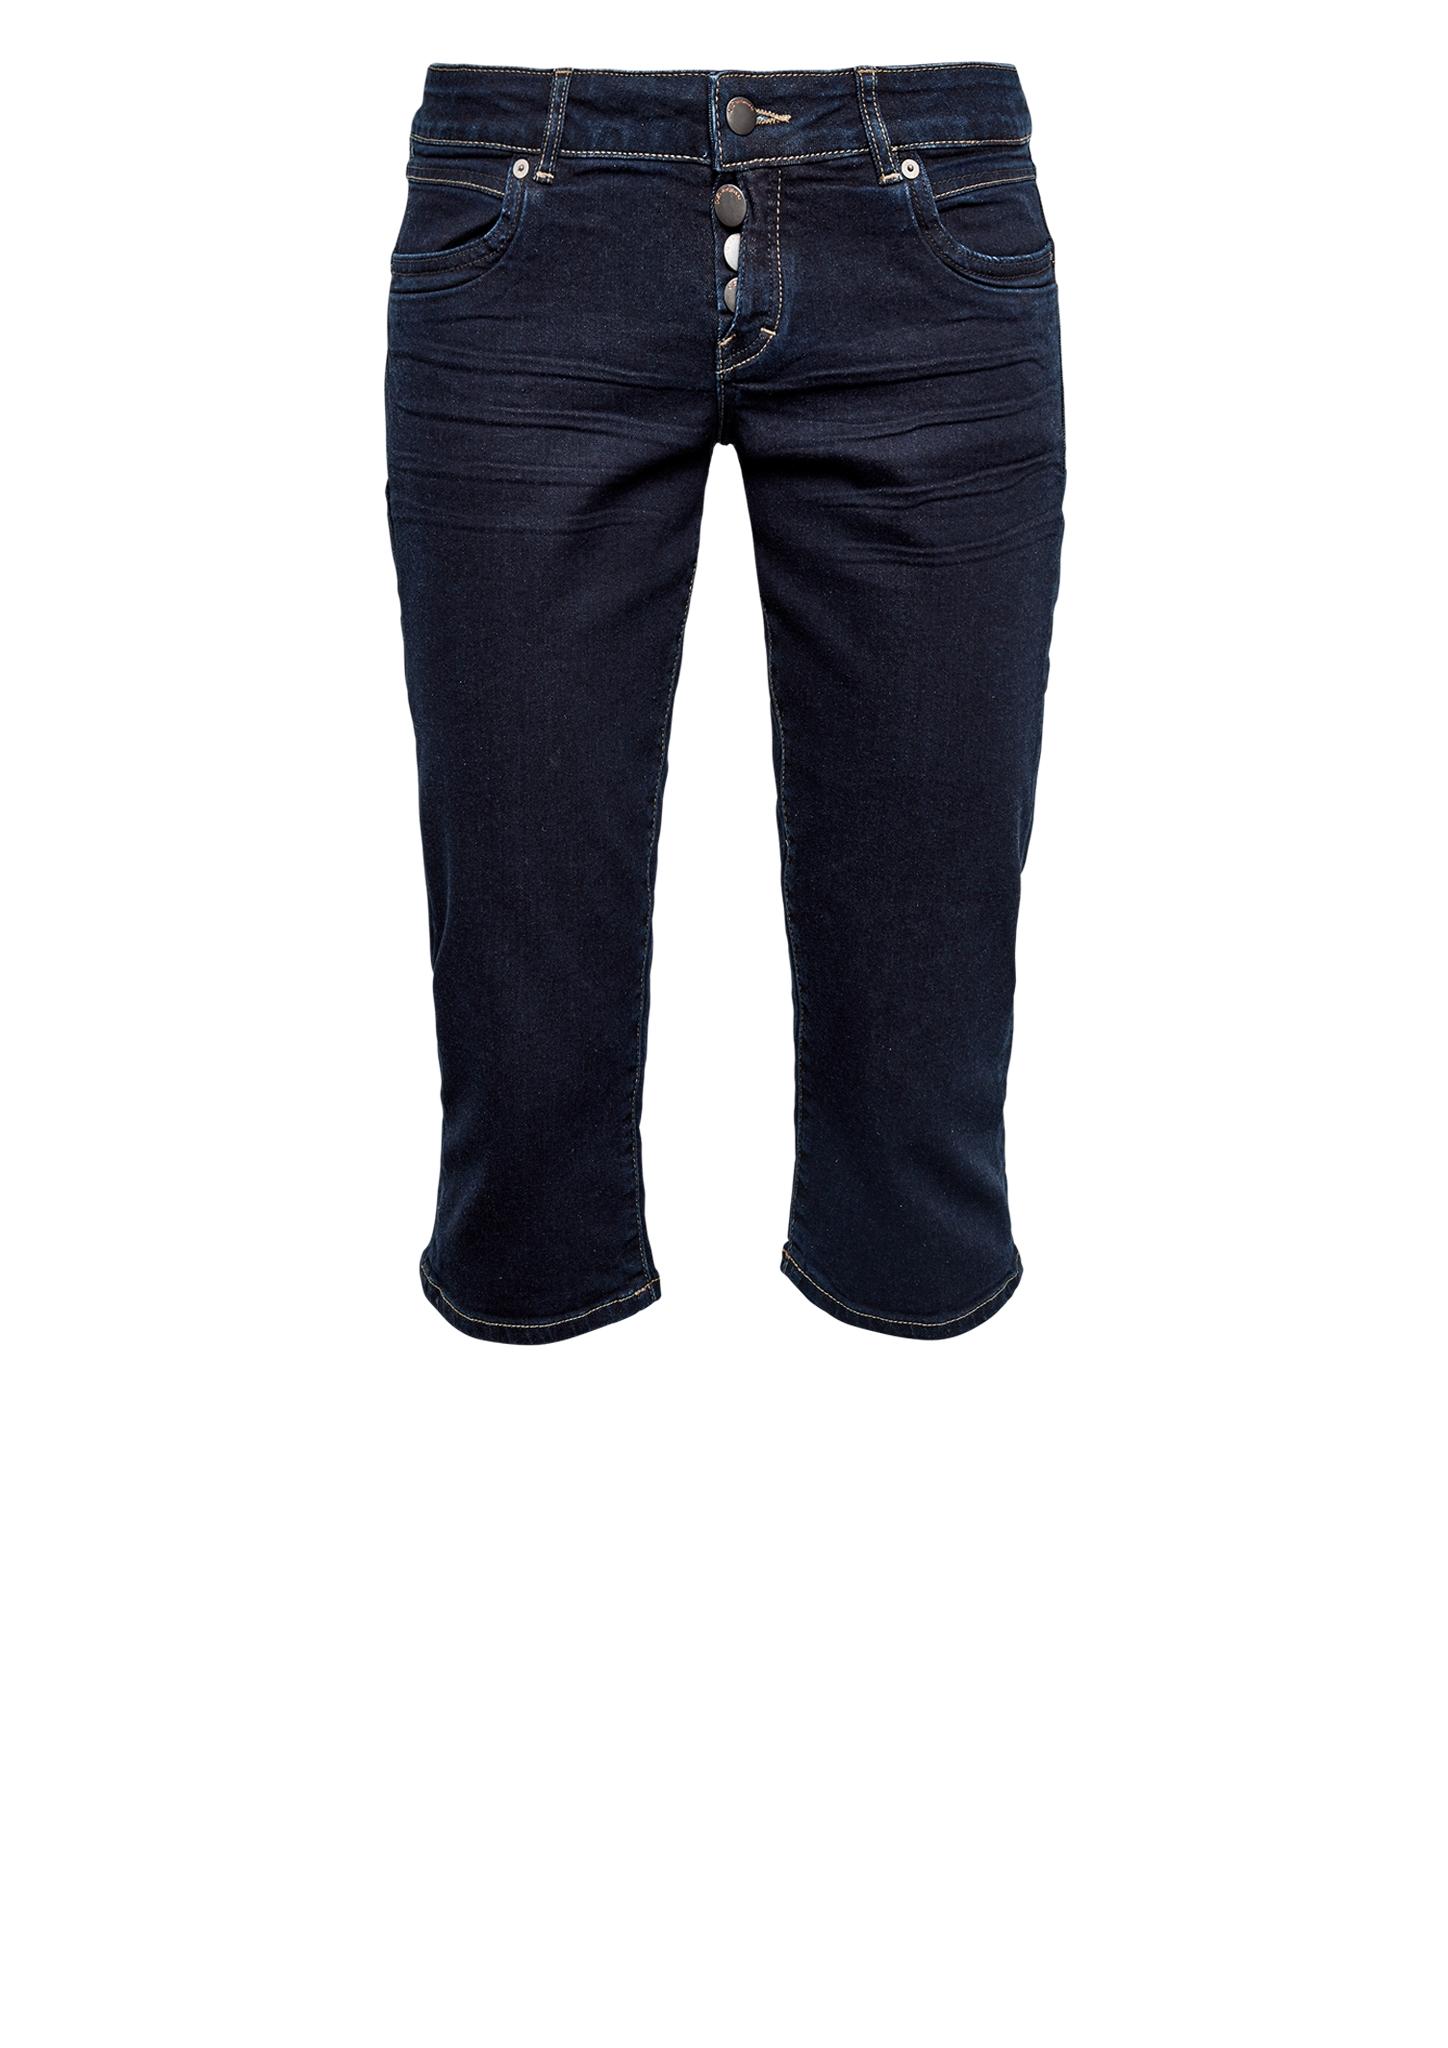 Capri-Jeans | Bekleidung > Jeans > Caprijeans | Blau | 99% baumwolle -  1% elasthan | Q/S designed by